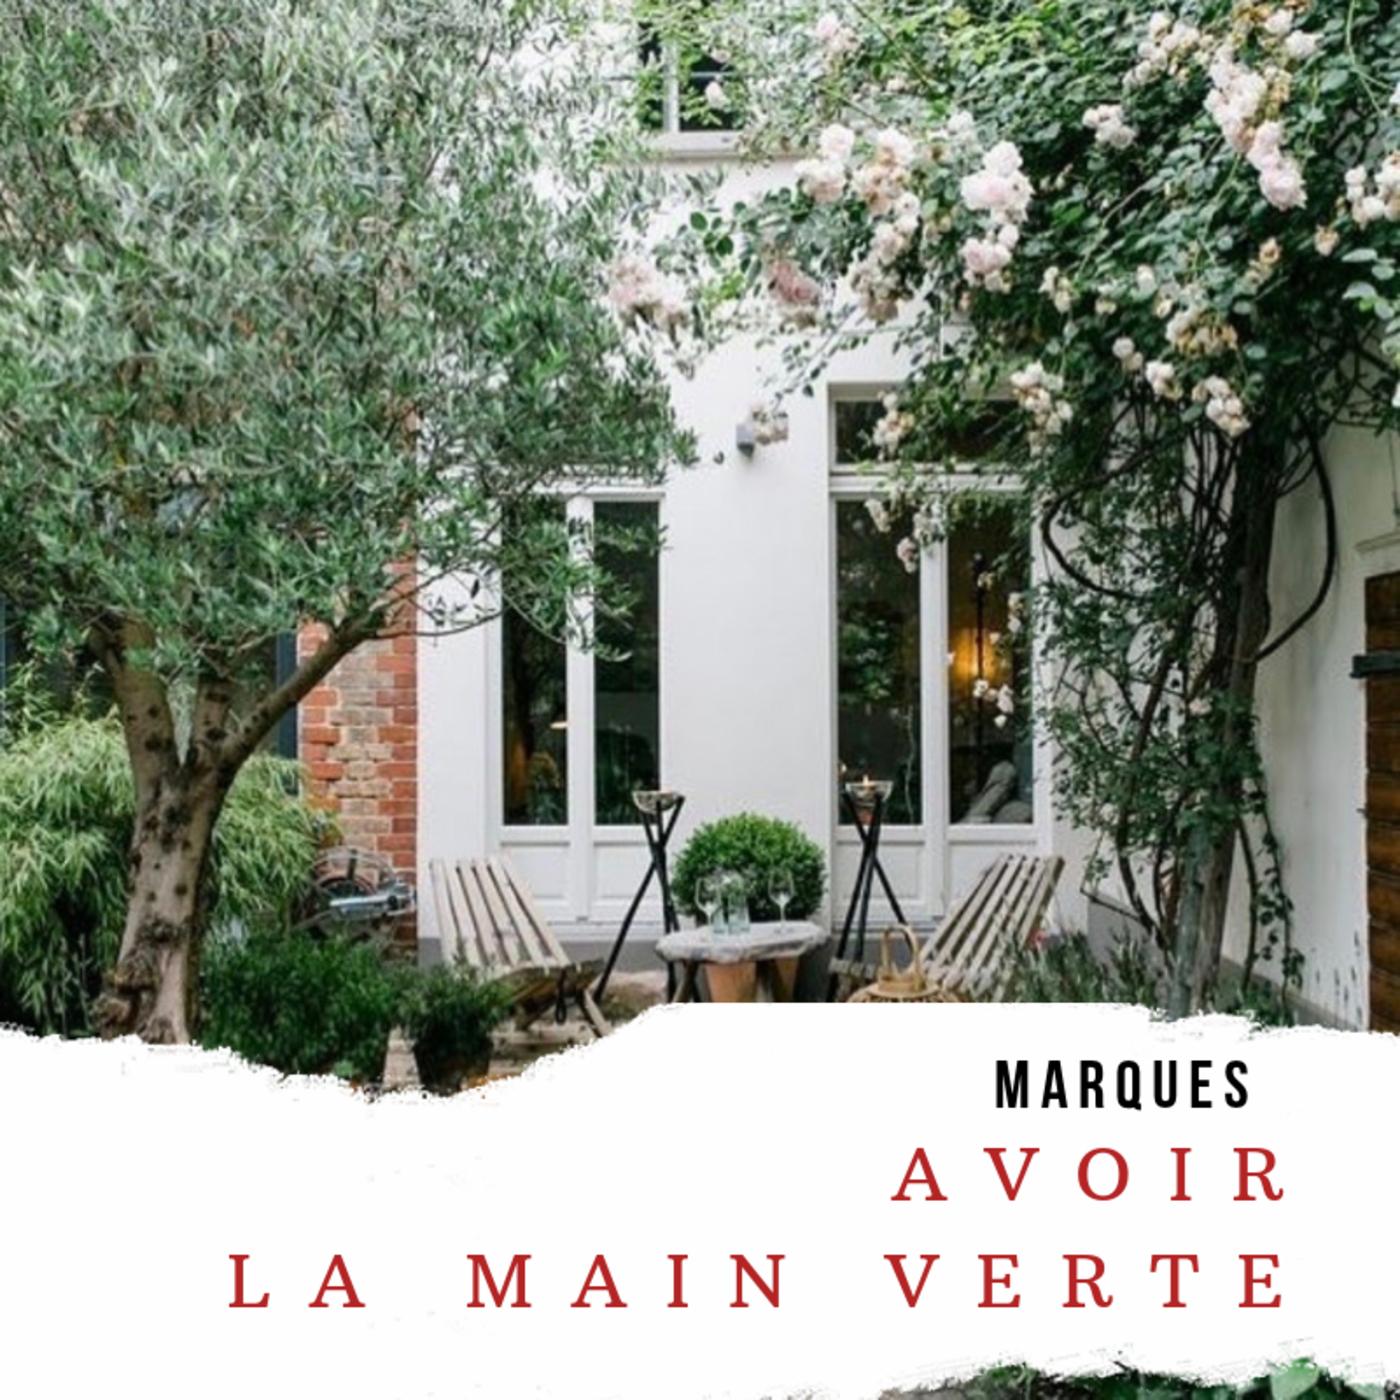 Cendrine Dominguez » Jardiland #3 : Avoir La Main Verte ... encequiconcerne Arche Jardin Jardiland